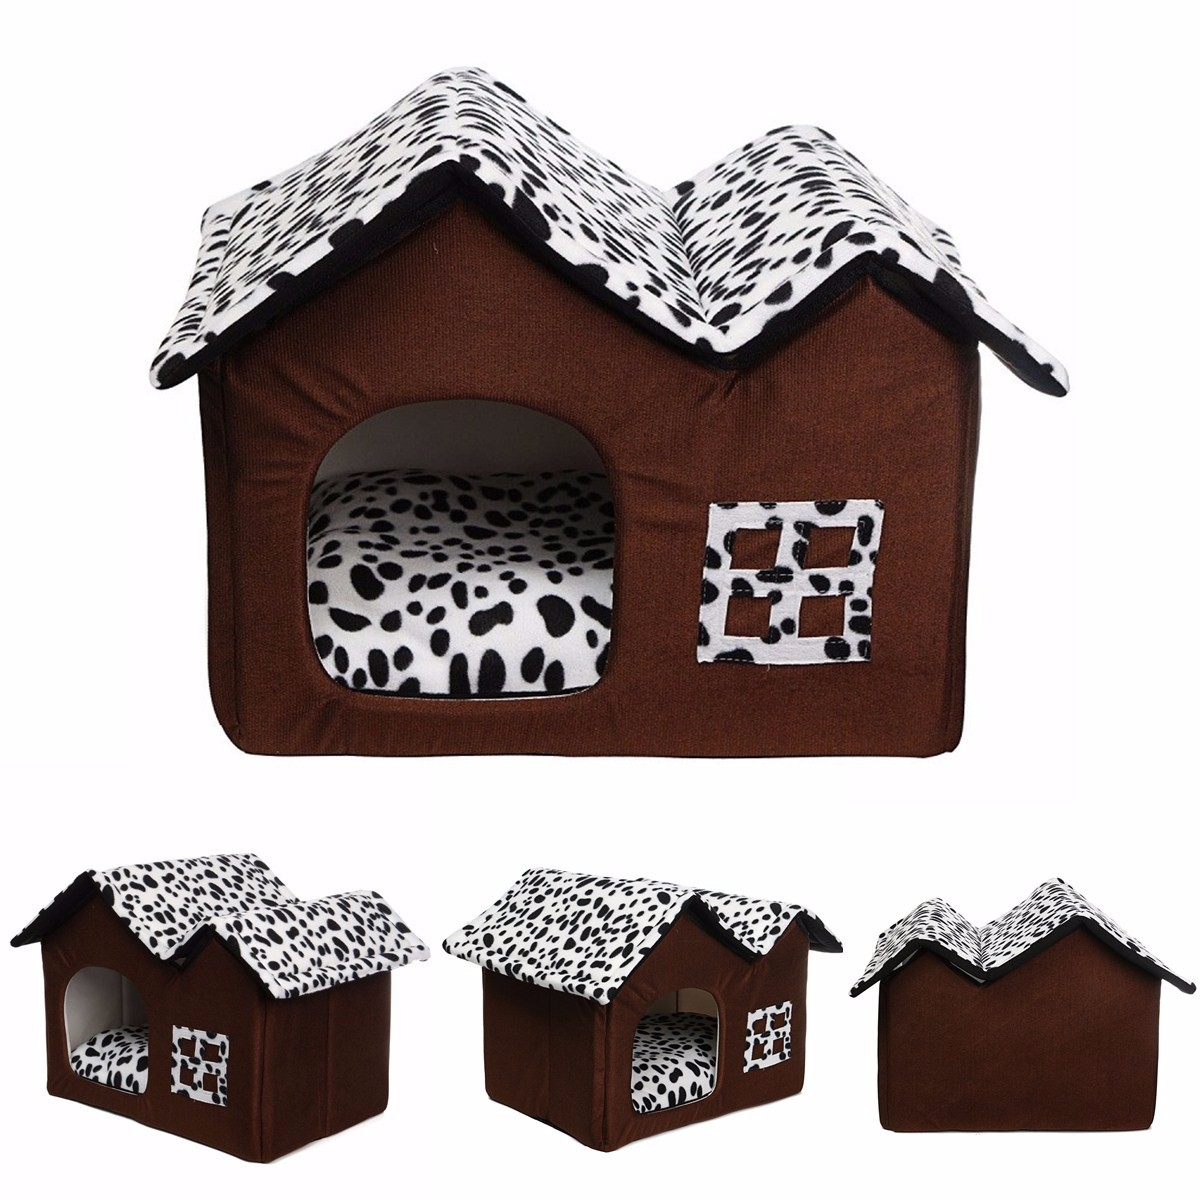 Soft Dog Indoor House Double Room Cat Kennel Pet Puppy Bed House Winter Warm Walmart Com Walmart Com